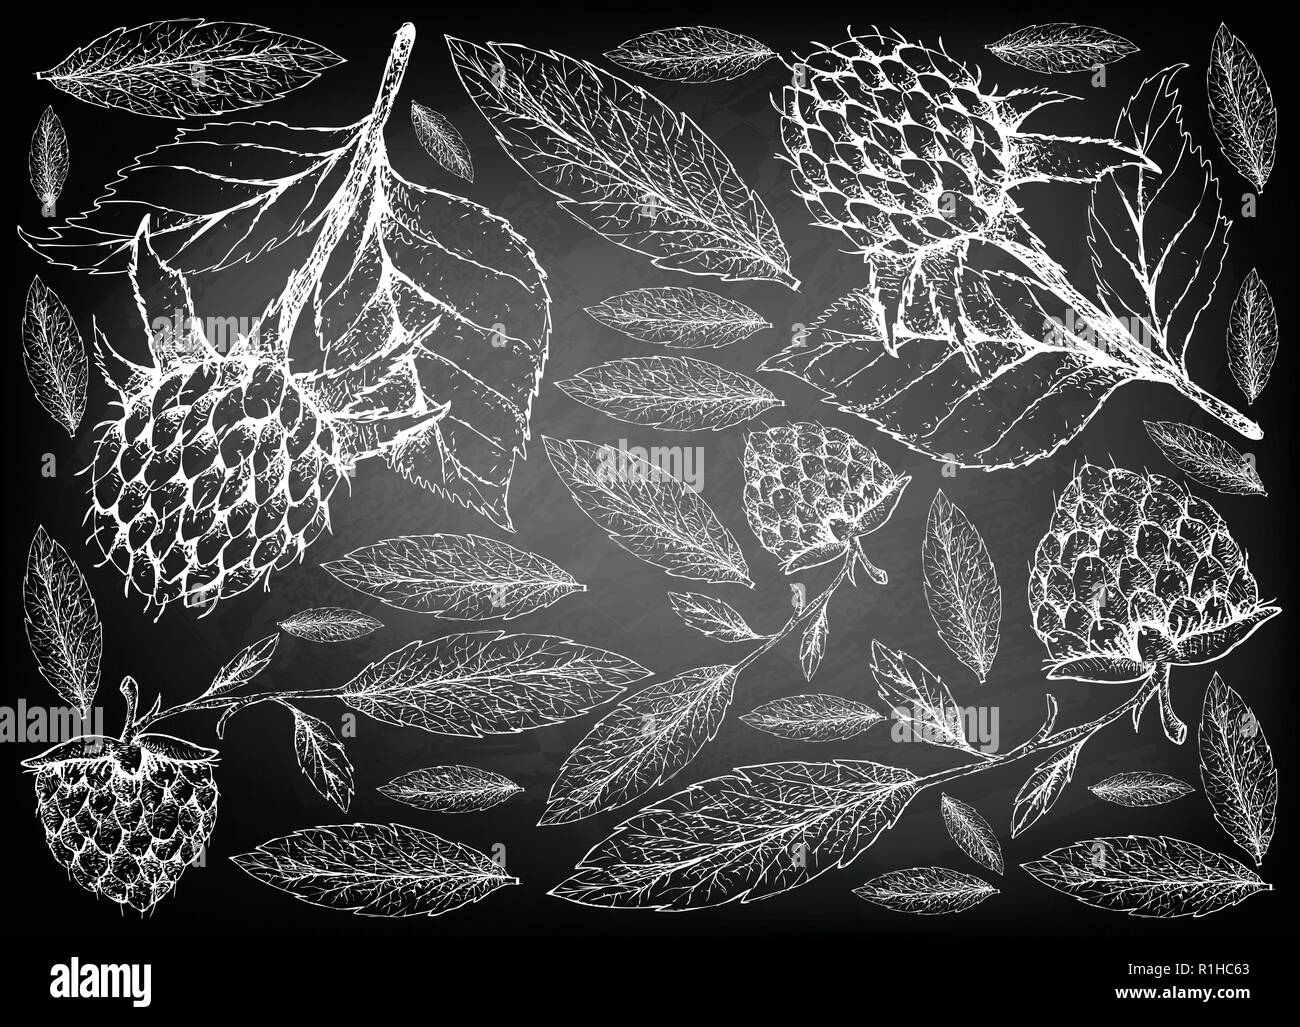 Berry Fruits, Illustration Wallpaper of Hand Drawn Sketch  Fresh Korean Black Raspberries or Rubus Coreanus and Golden Raspberries or Rubus Ellipticus - Stock Vector